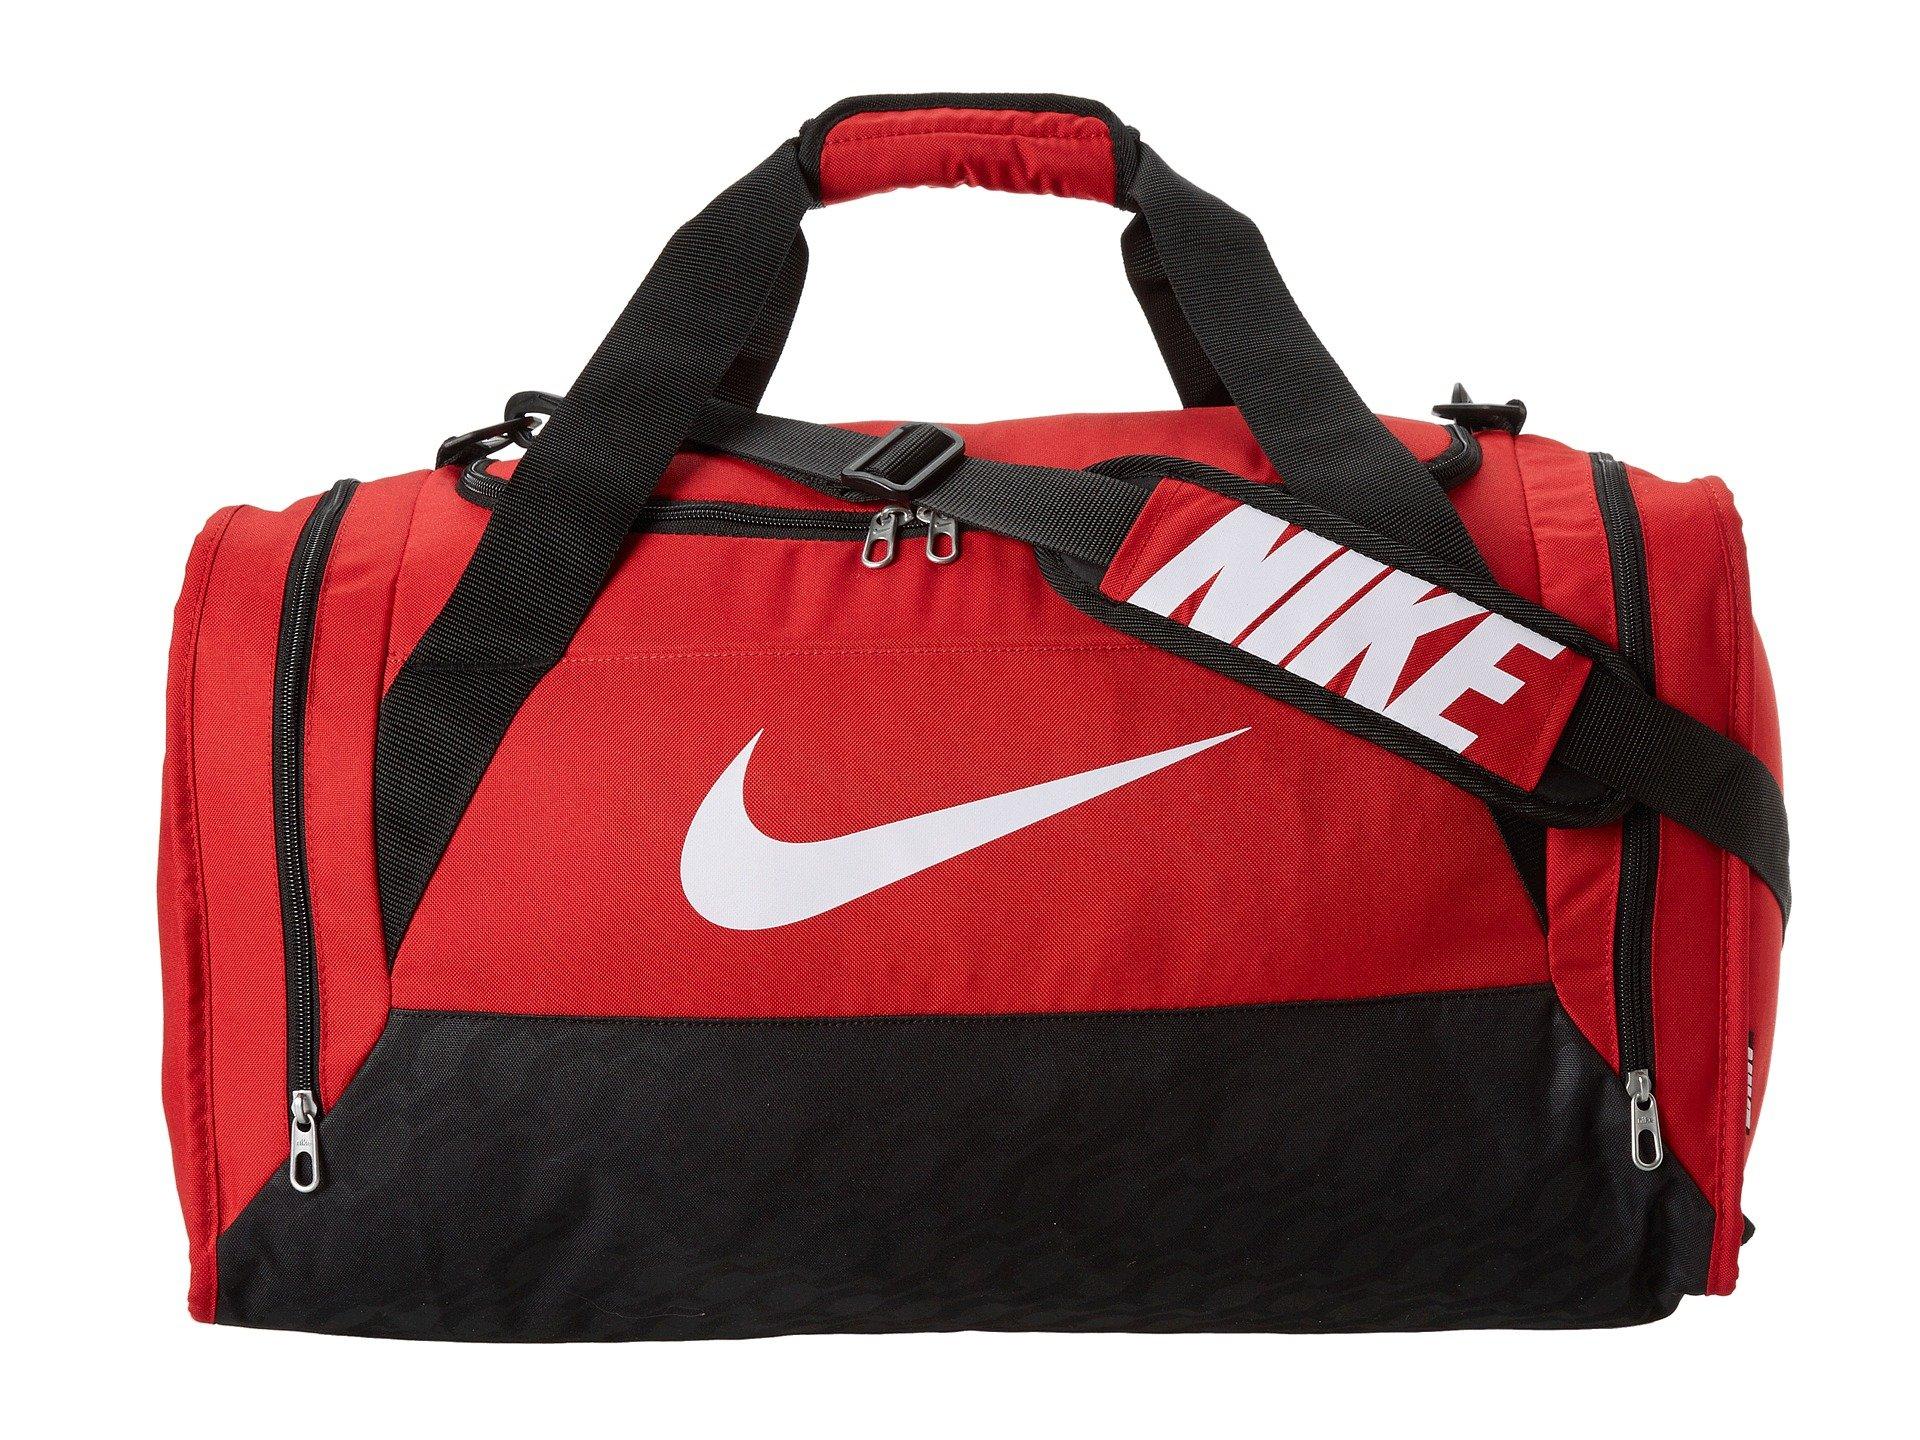 6451382d1465 Lyst - Nike Brasilia 6 Medium Duffel in Red